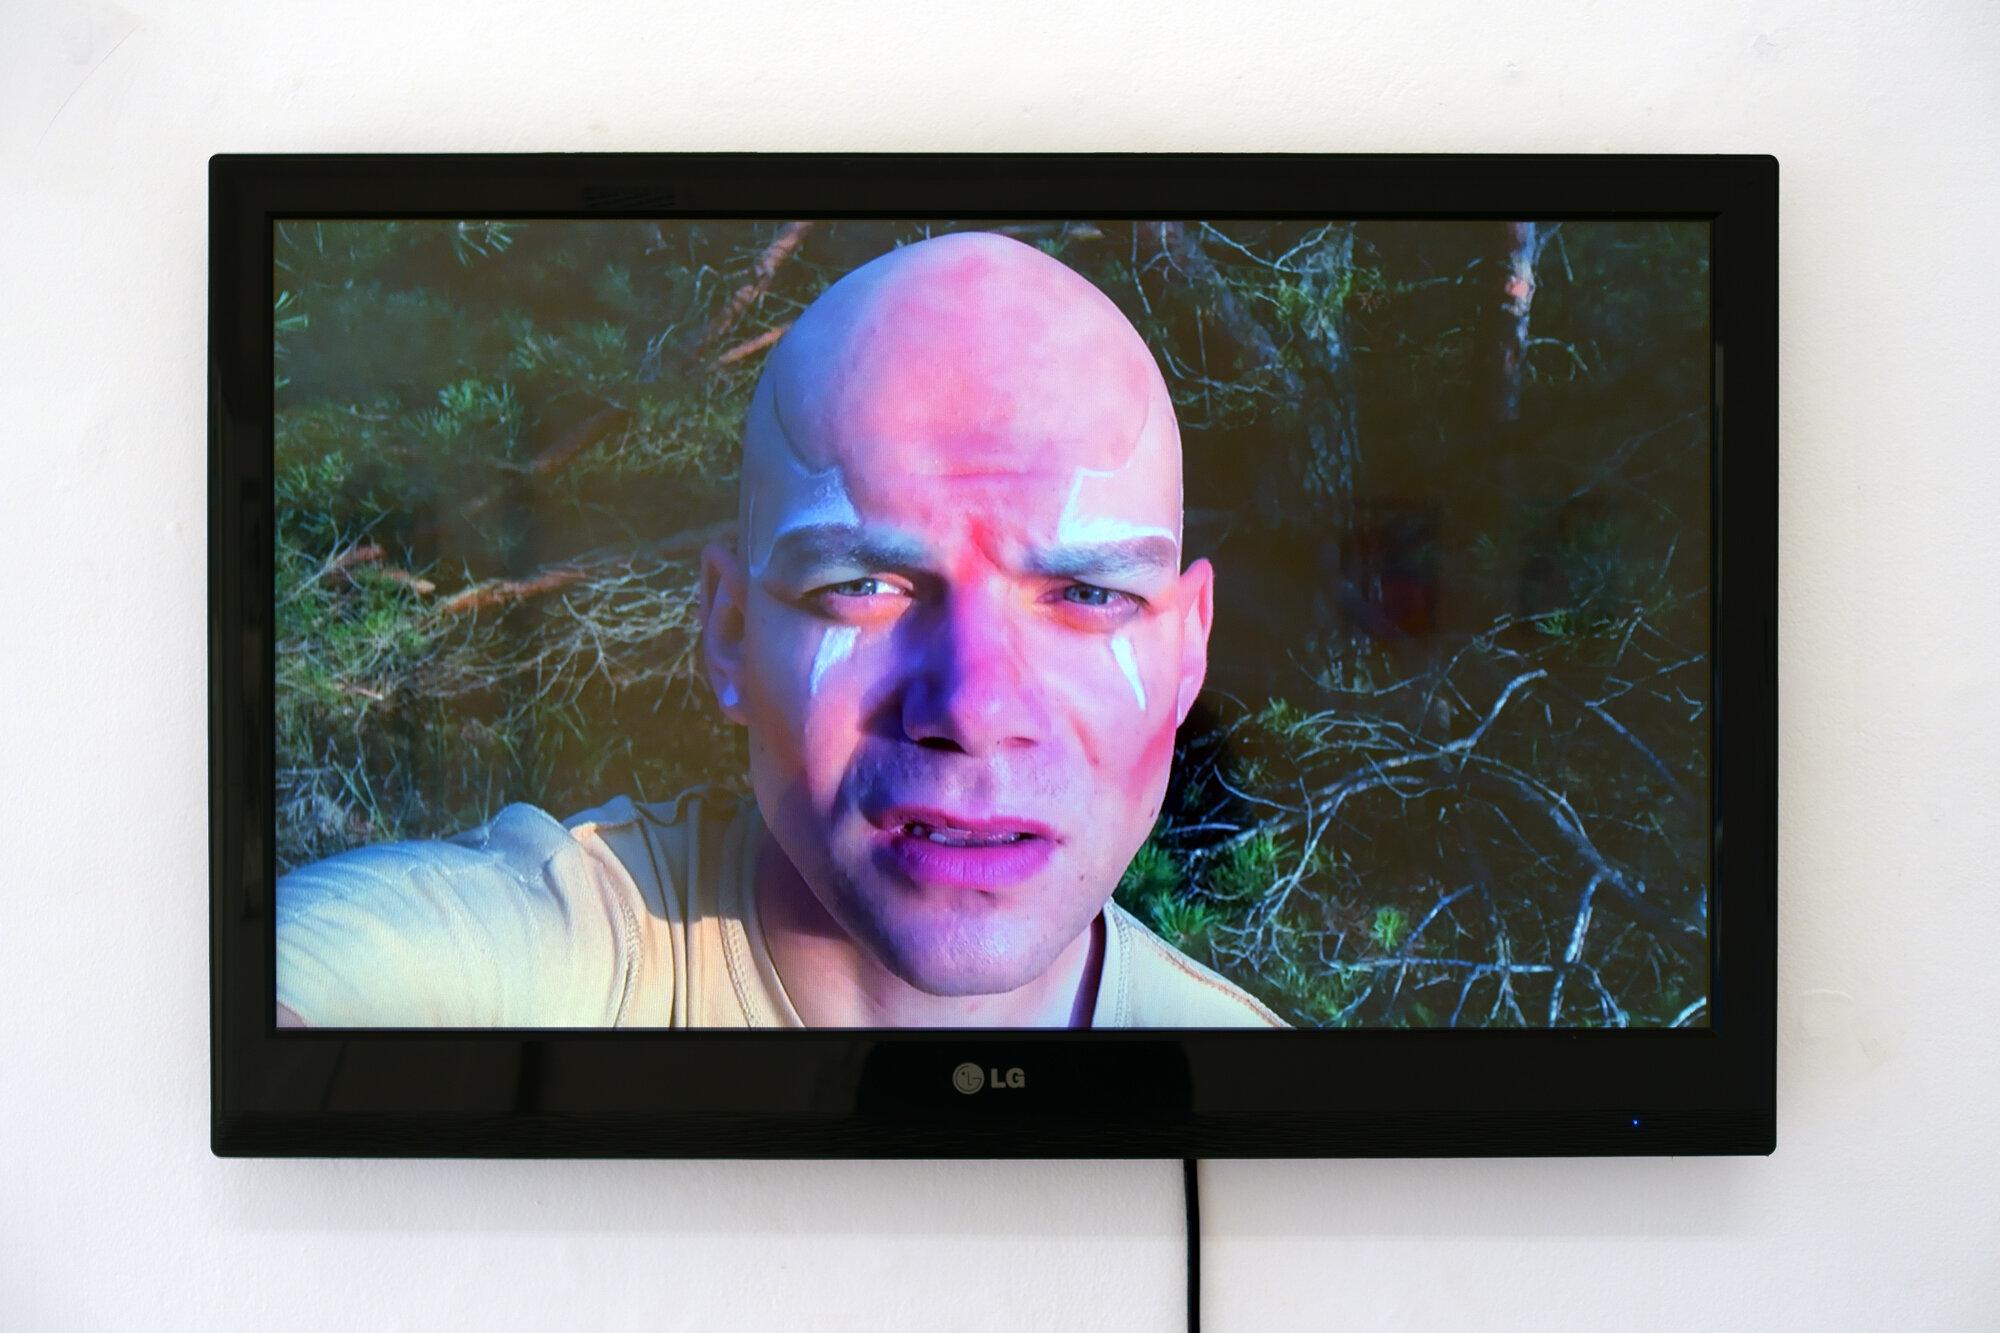 C. Edwards - J. Baumgartner Video 3.jpg